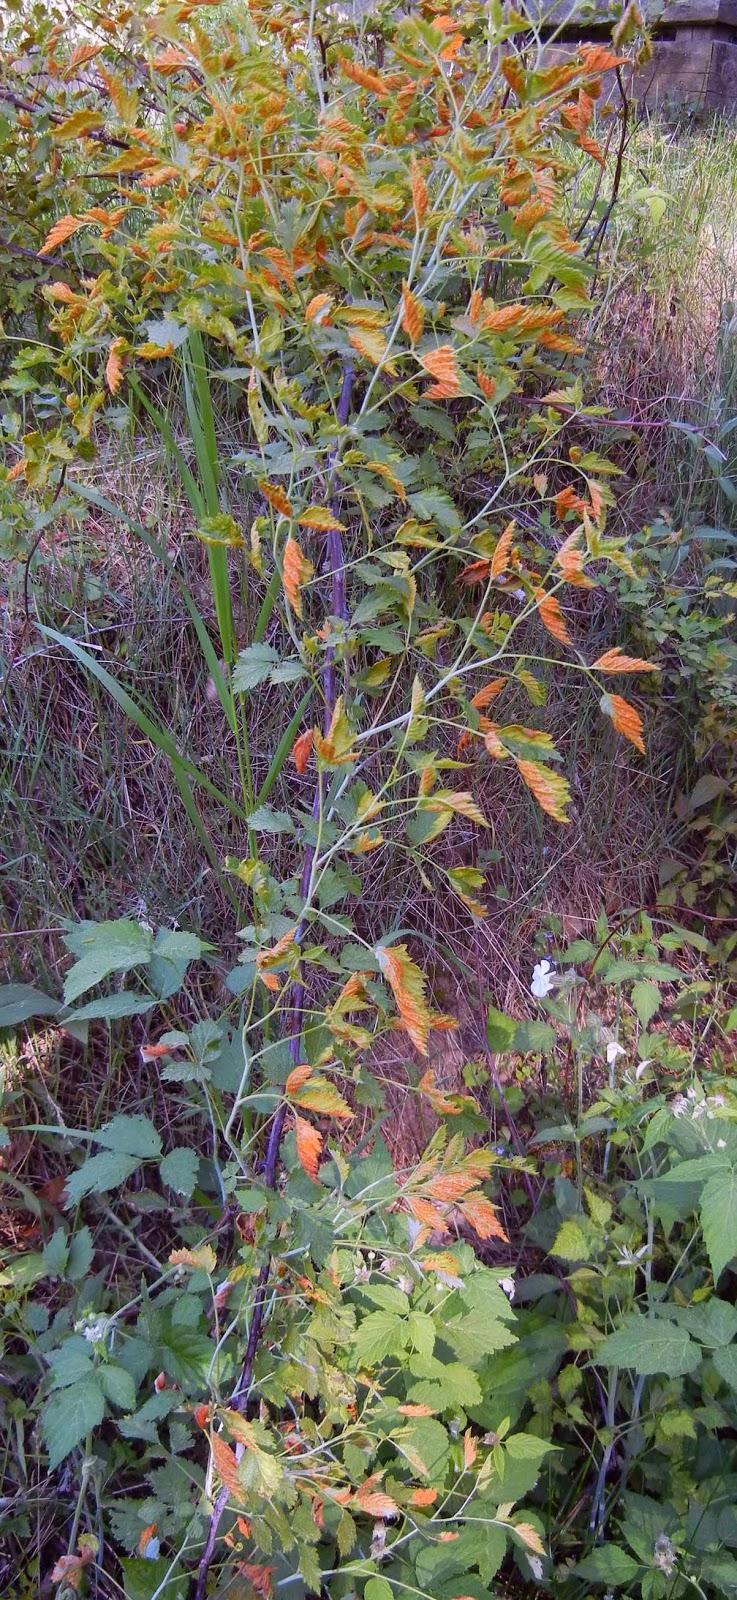 blackberries infected with orange rust fungus